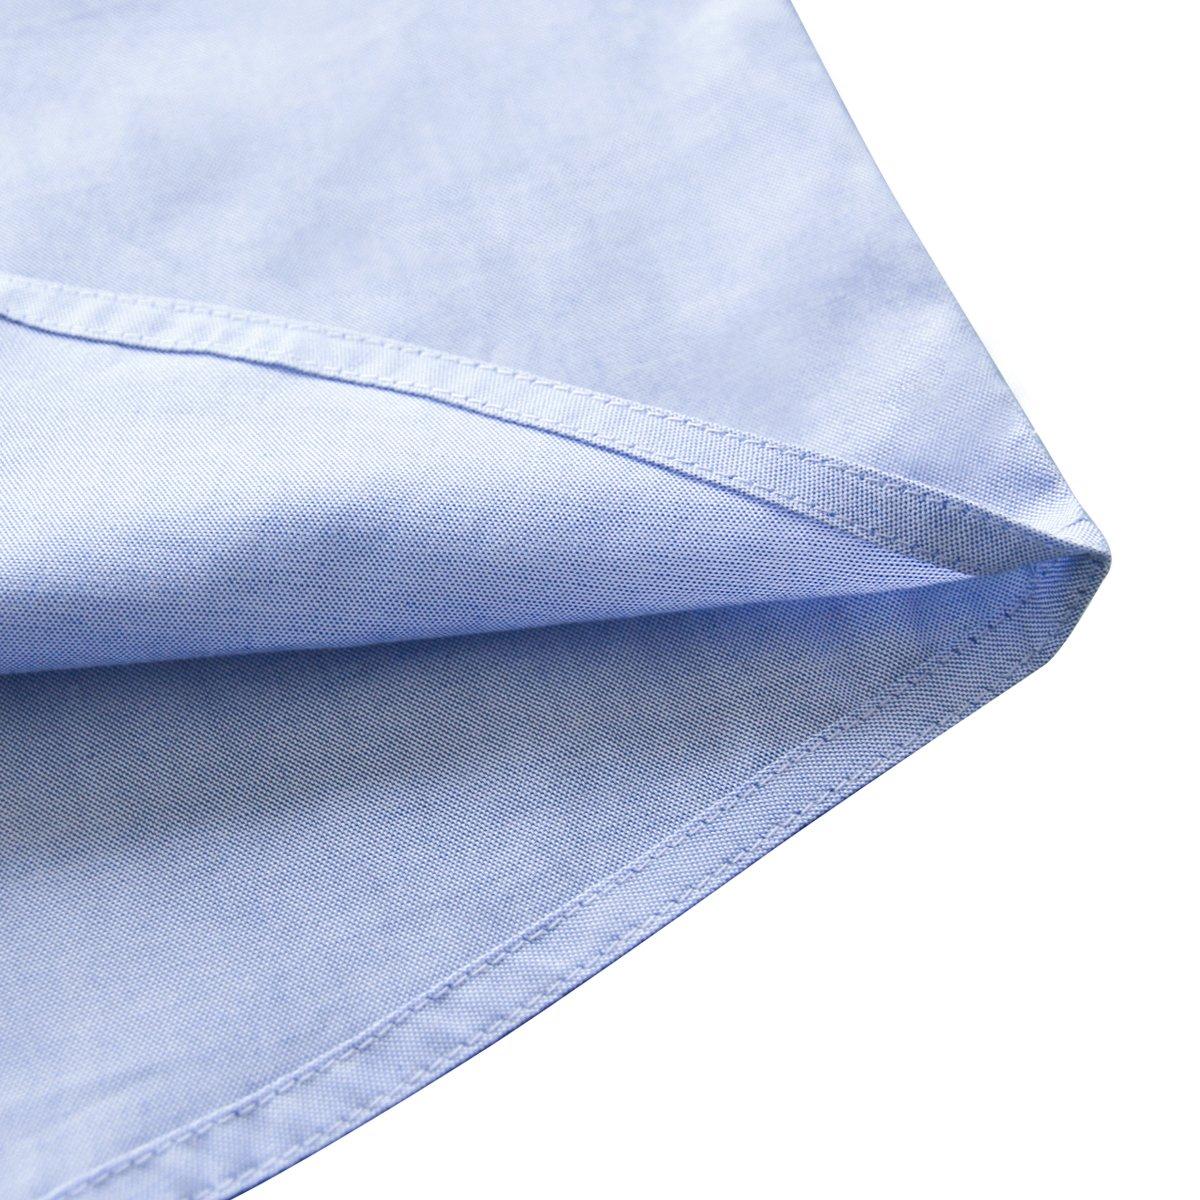 Bebone Jungen Hemd 2-7 Jahre Alt Kinder Kurzarm Bluse